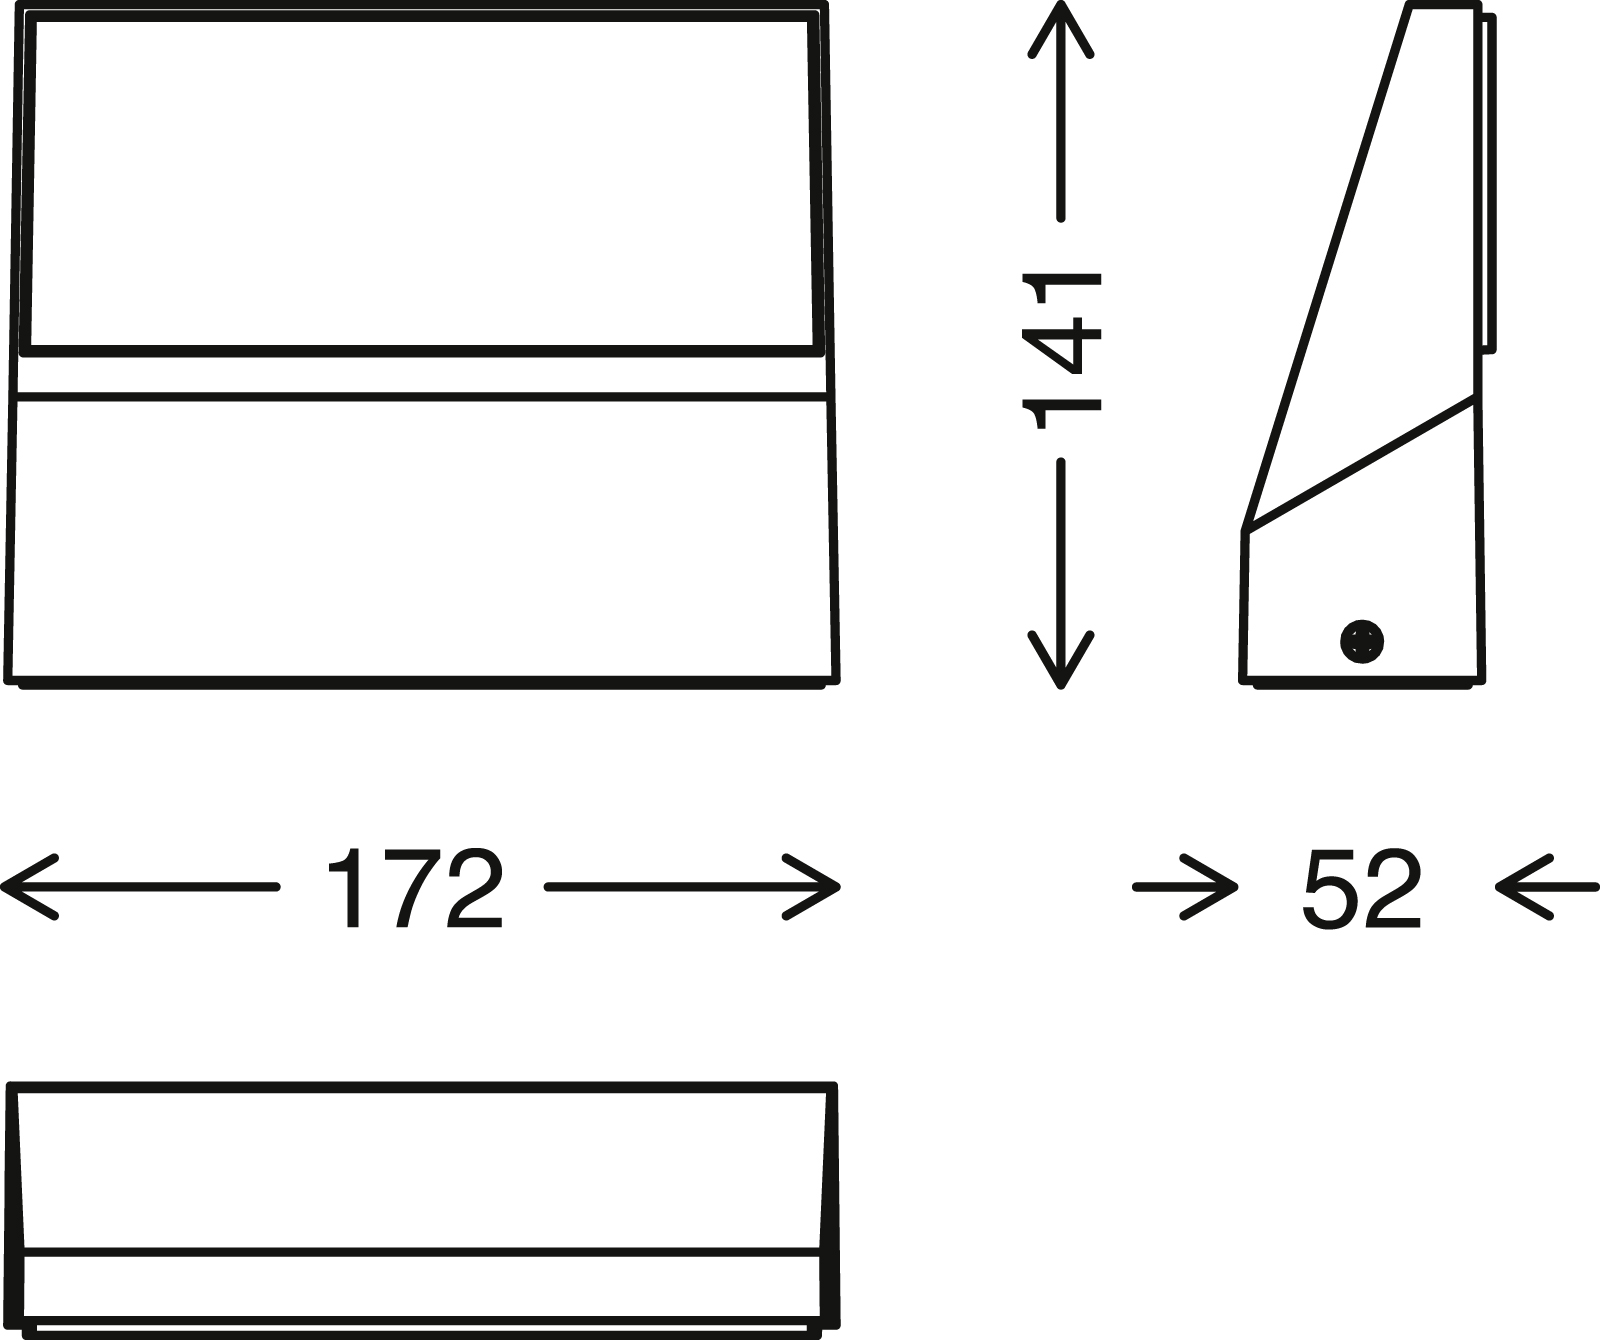 TELEFUNKEN LED Aussenwandleuchte, 17,2 cm, 10 W, Schwarz